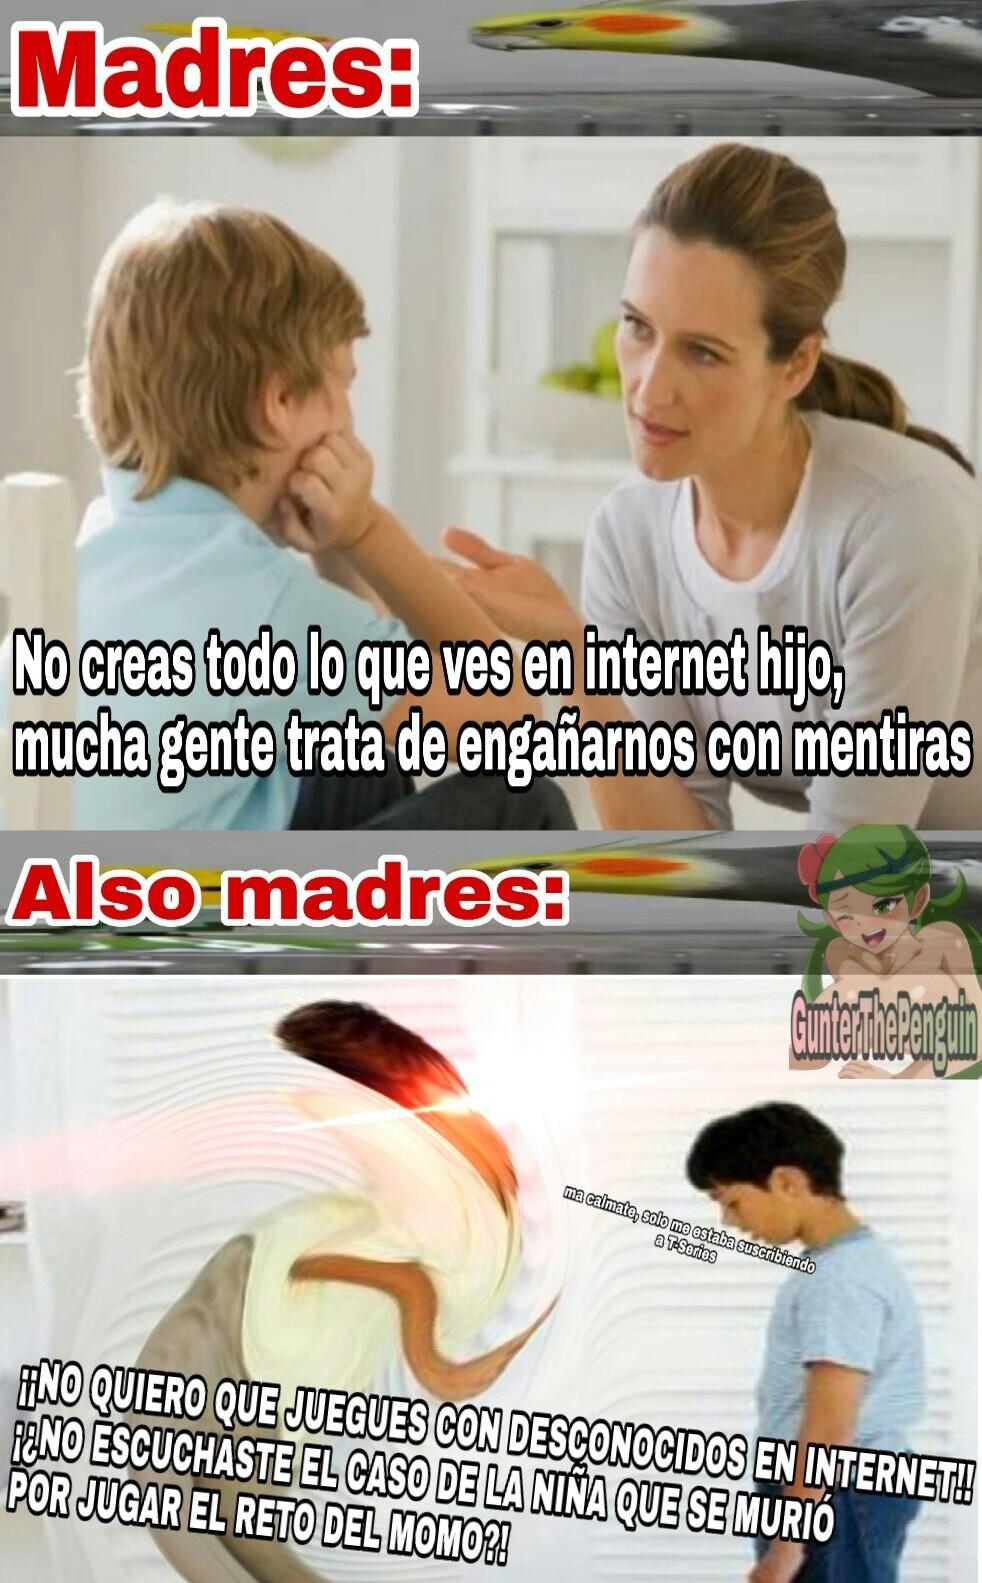 Madres be like - meme